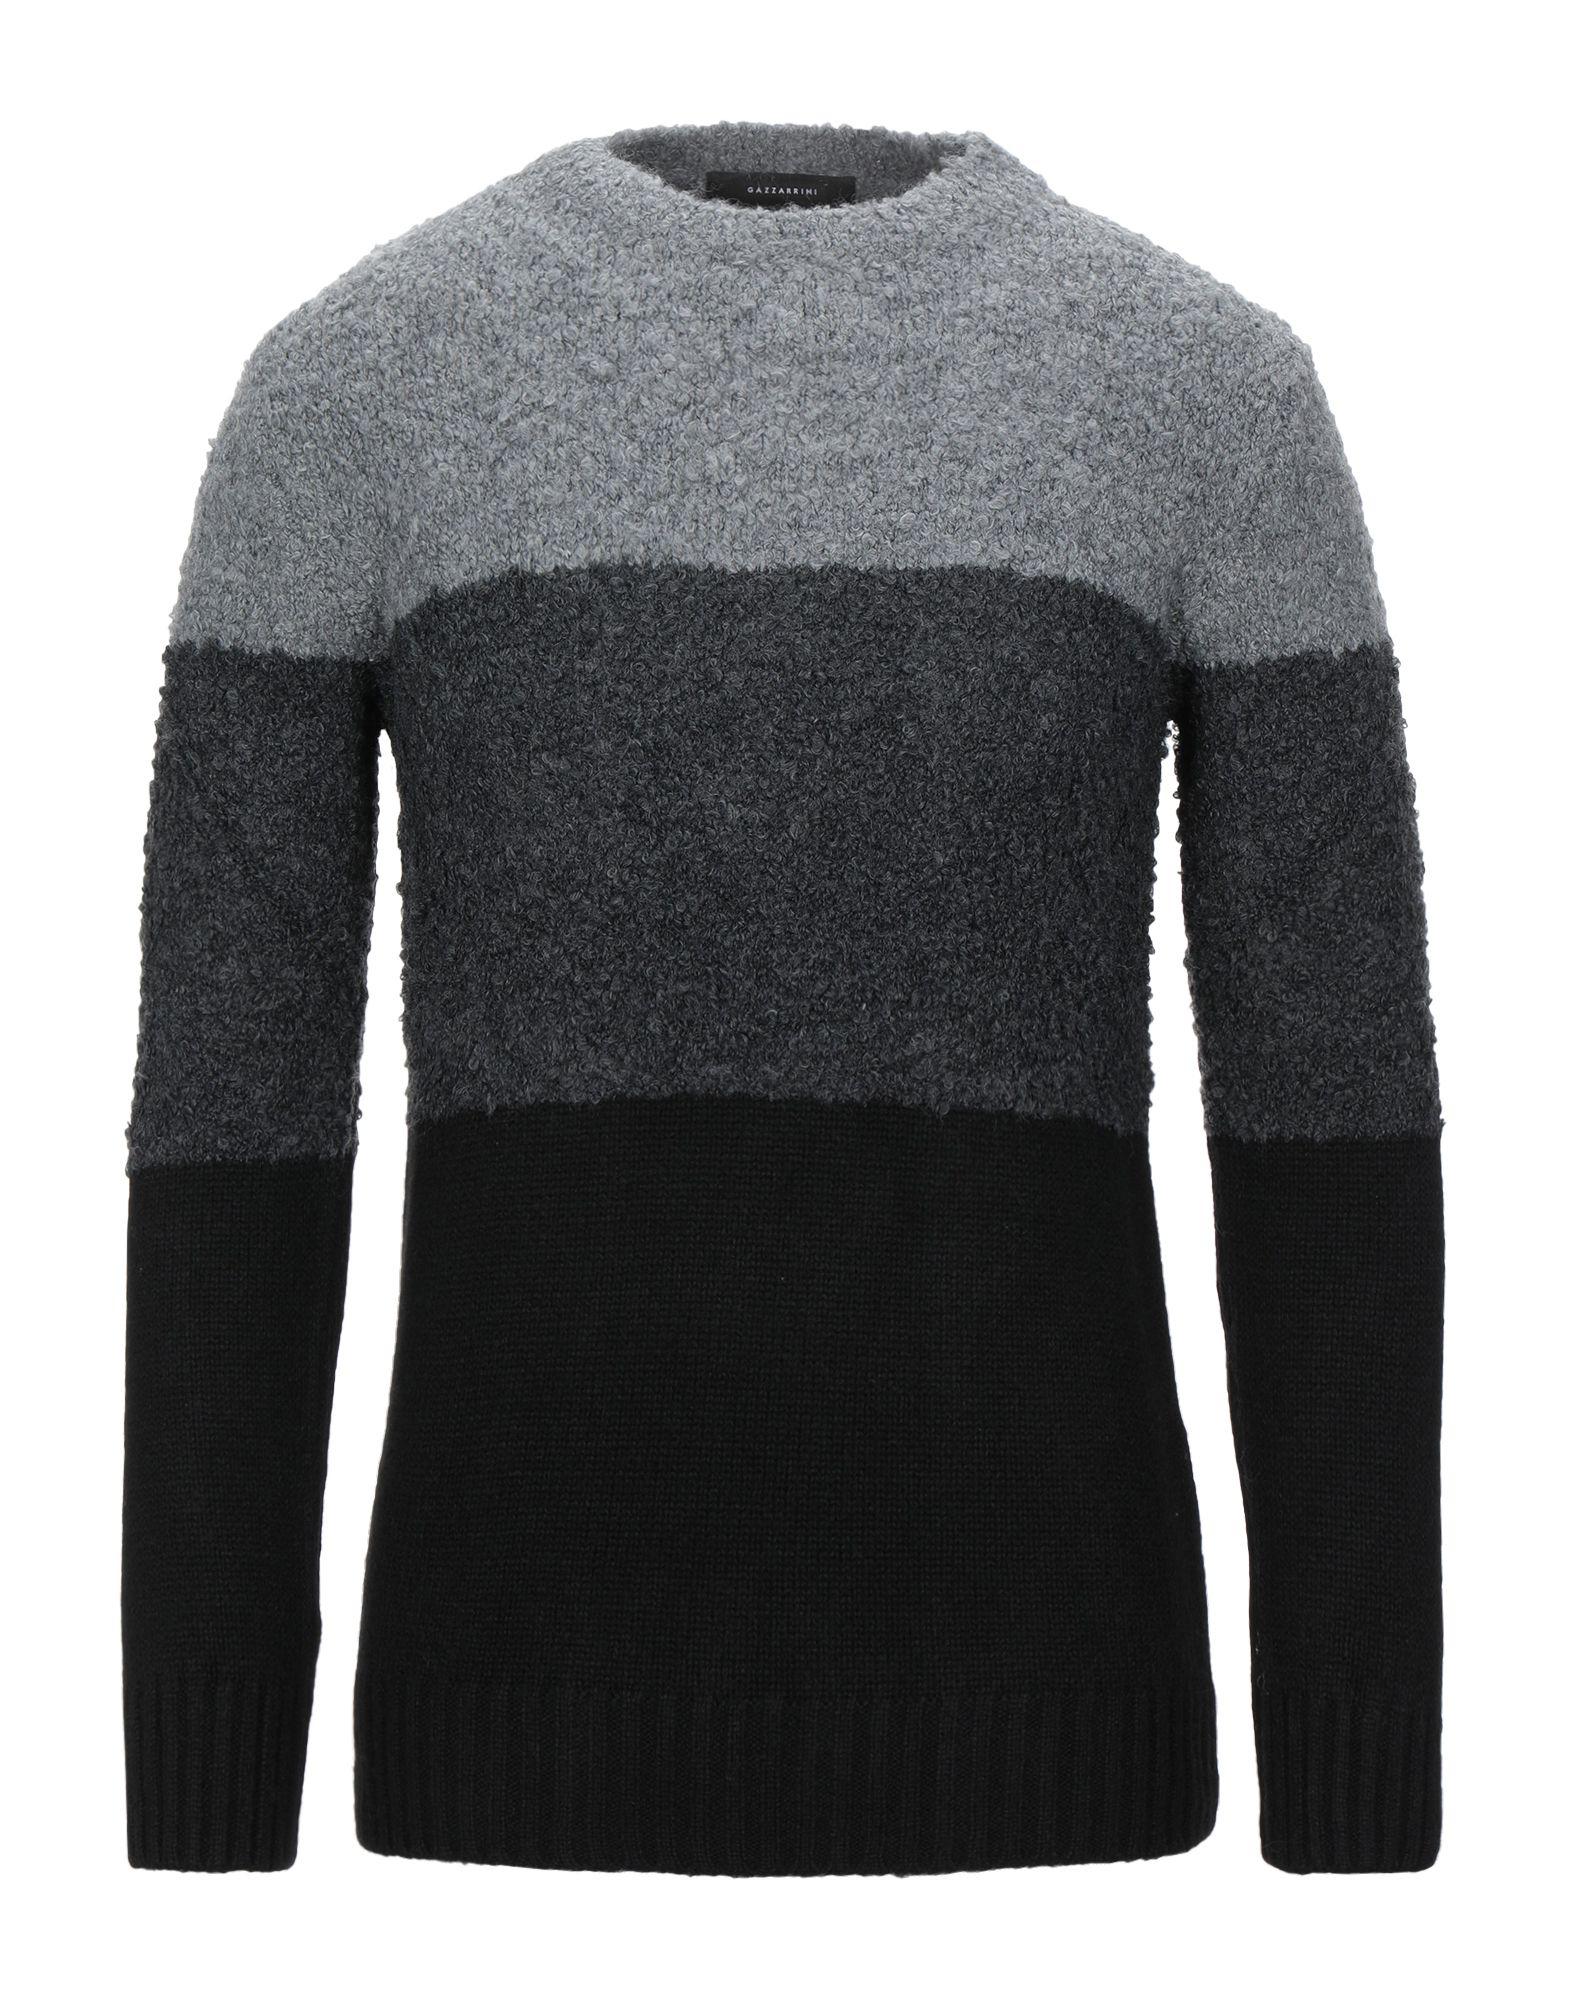 GAZZARRINI Свитер gazzarrini свитер